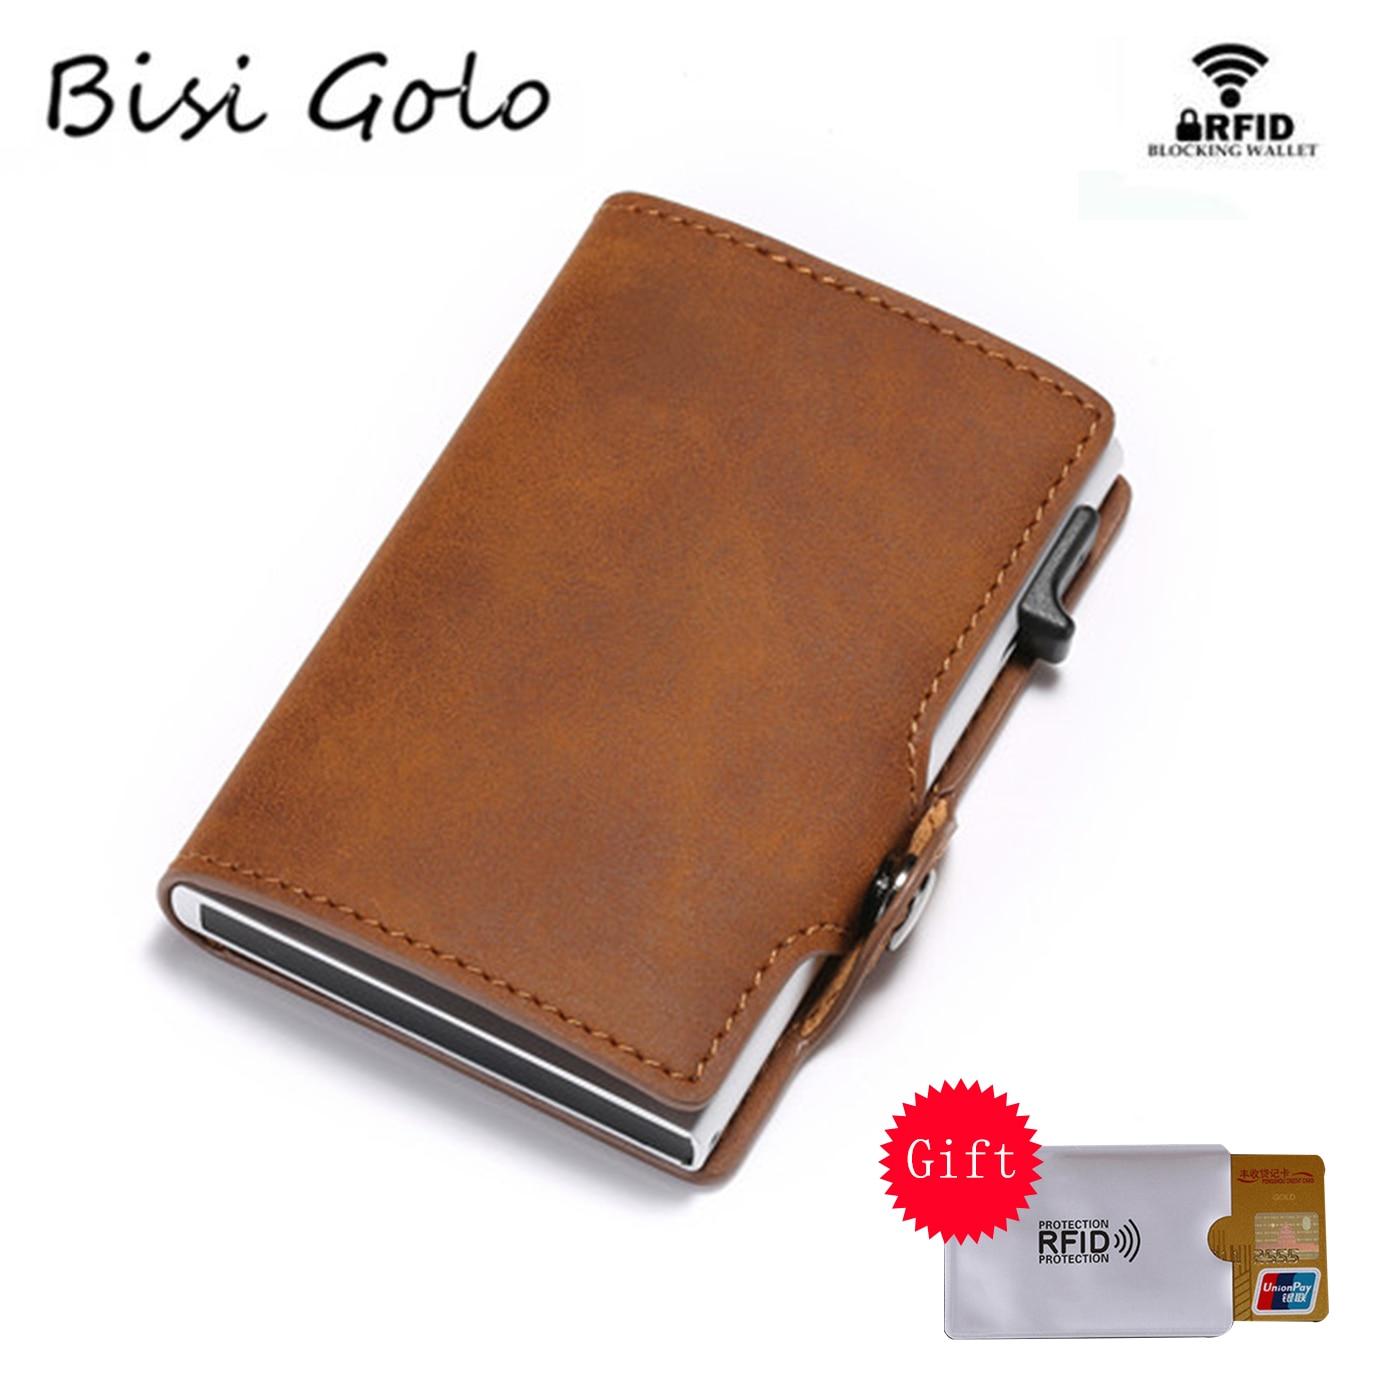 BISI GORO Fashion Wallet 2019 New Vintage Card Holder RFID Slim Suitcase Business Luxury Card Case Anti-theft Card Wholesale